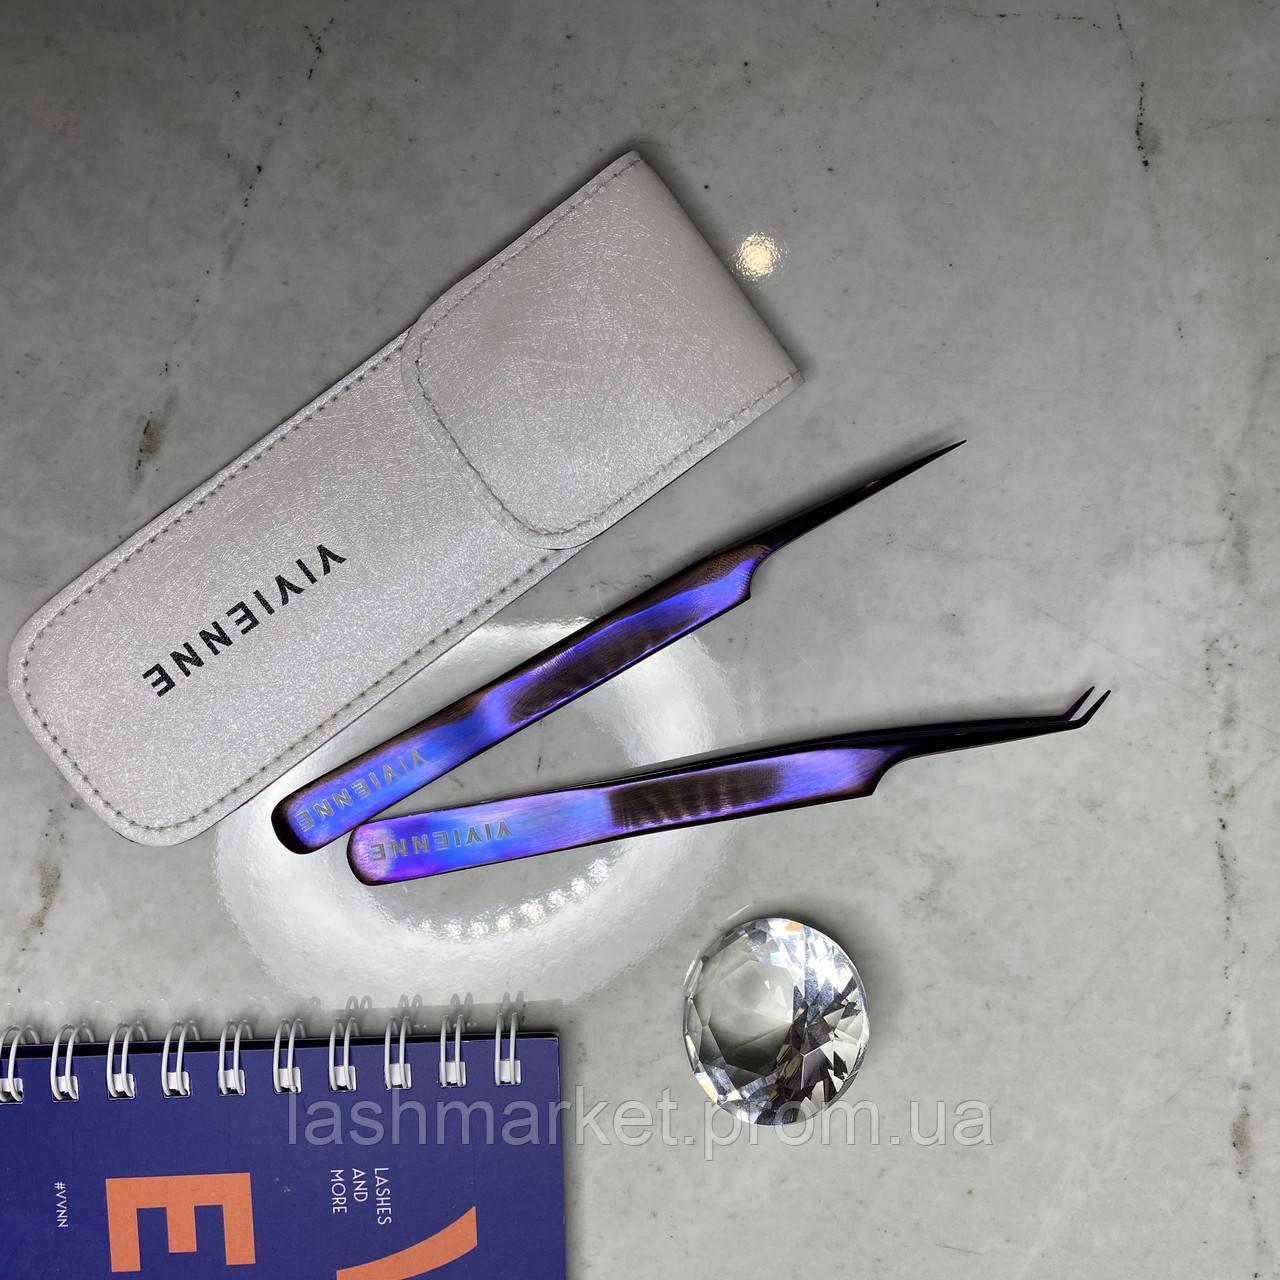 "Набор из 2 пинцетов ""Пурпурное сияние""(мини L и прямой+чехол ) для наращивания ресниц Vivienne"